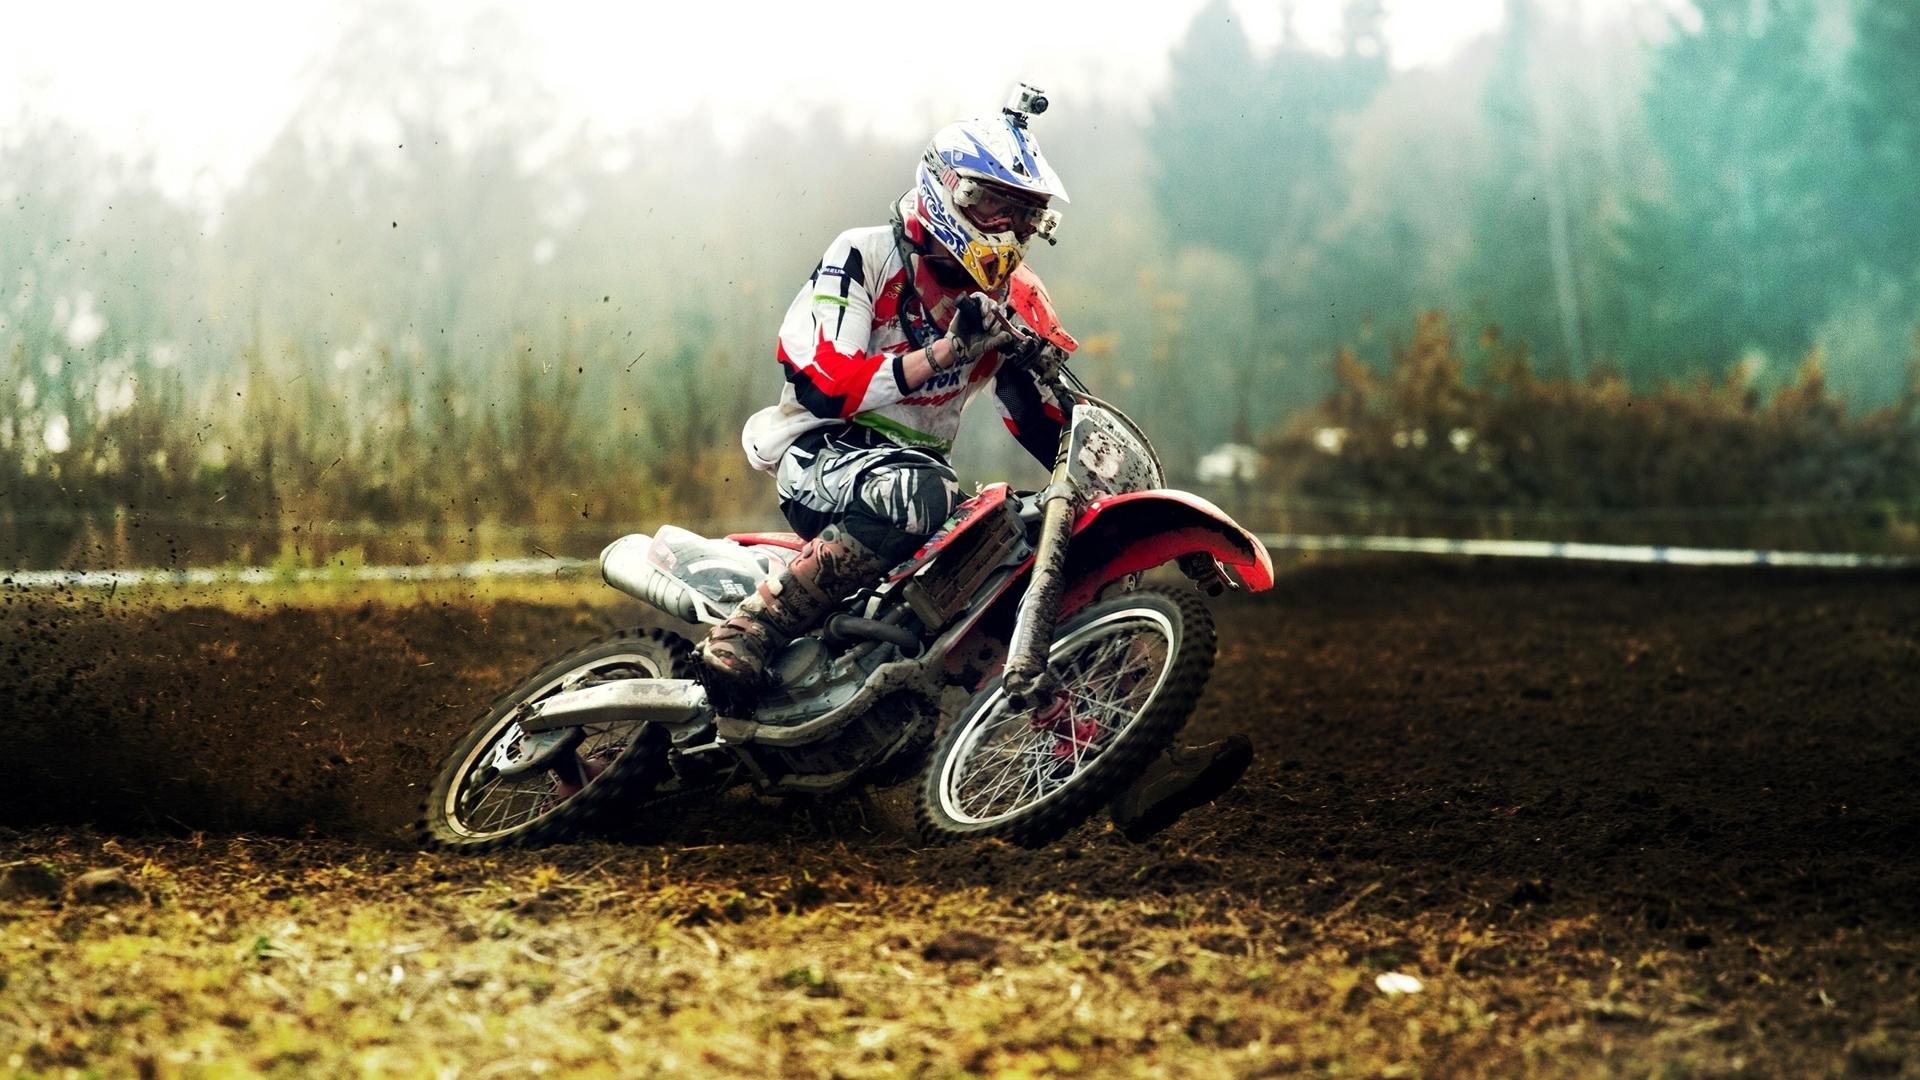 Motocross Wallpaper